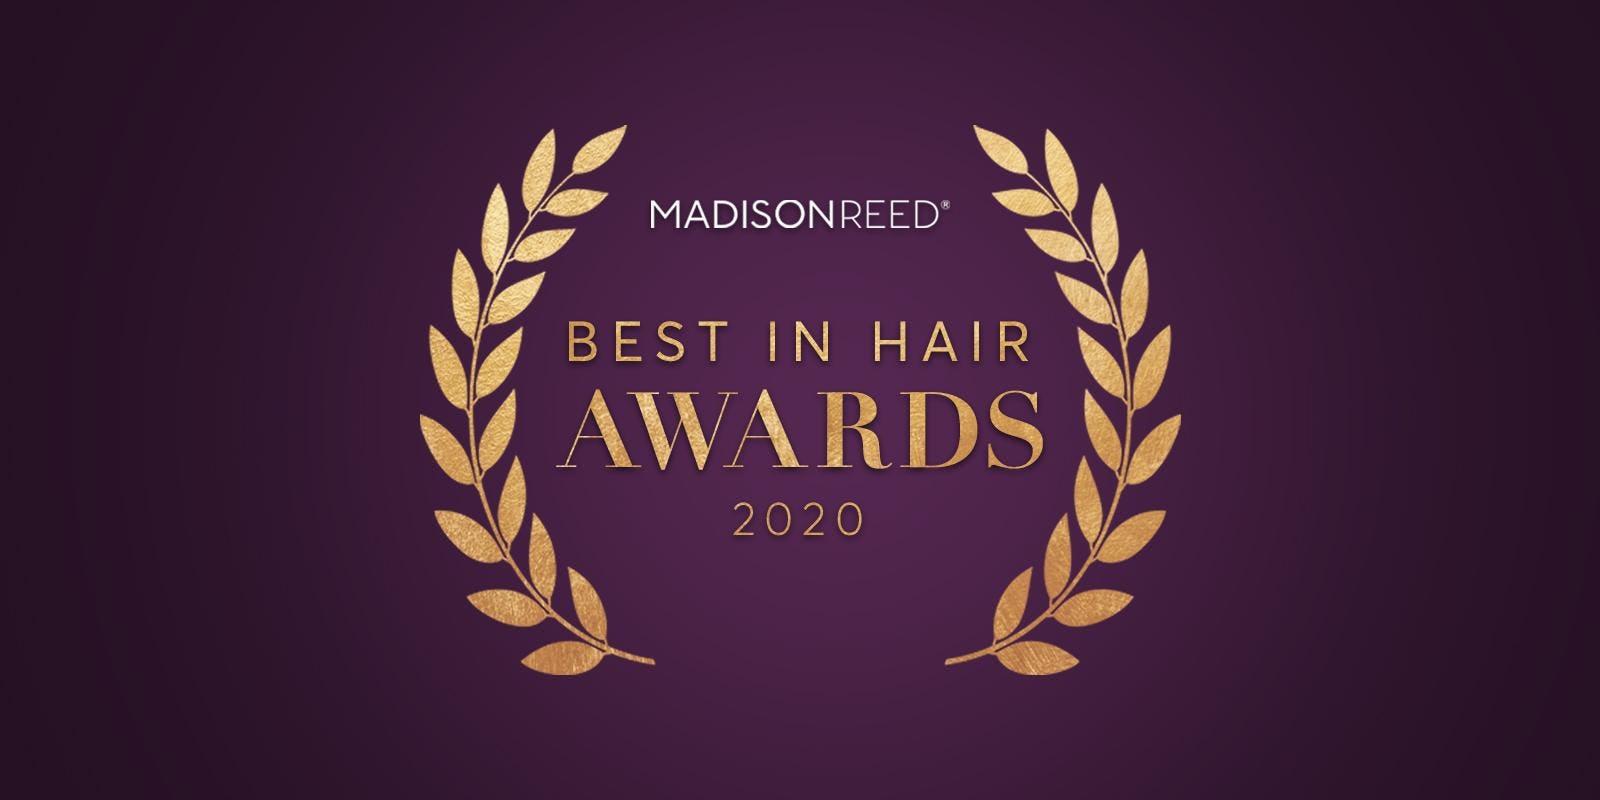 Best in Hair Awards 2020